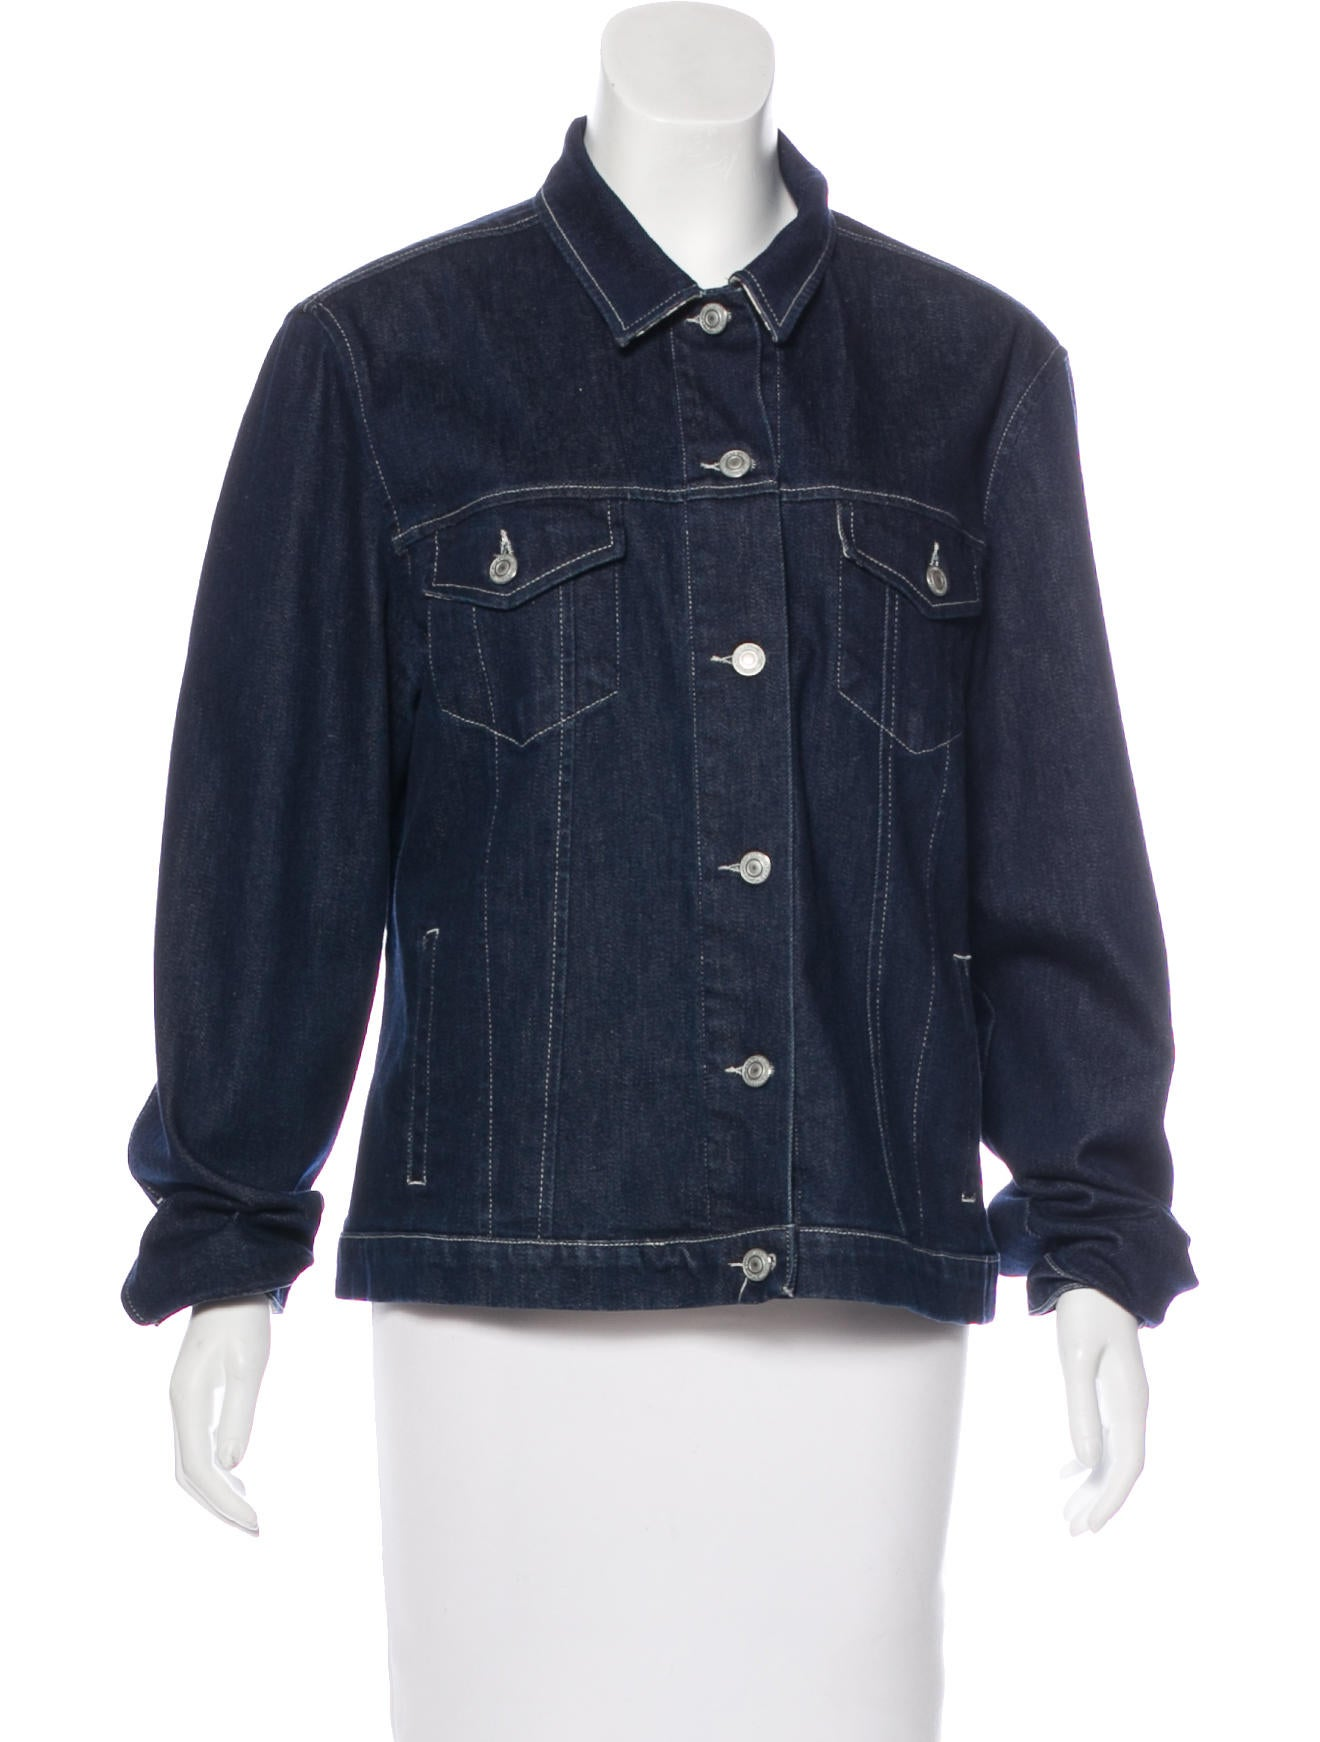 Burberry Dark Wash Denim Jacket - Clothing - BUR82692  723be047a